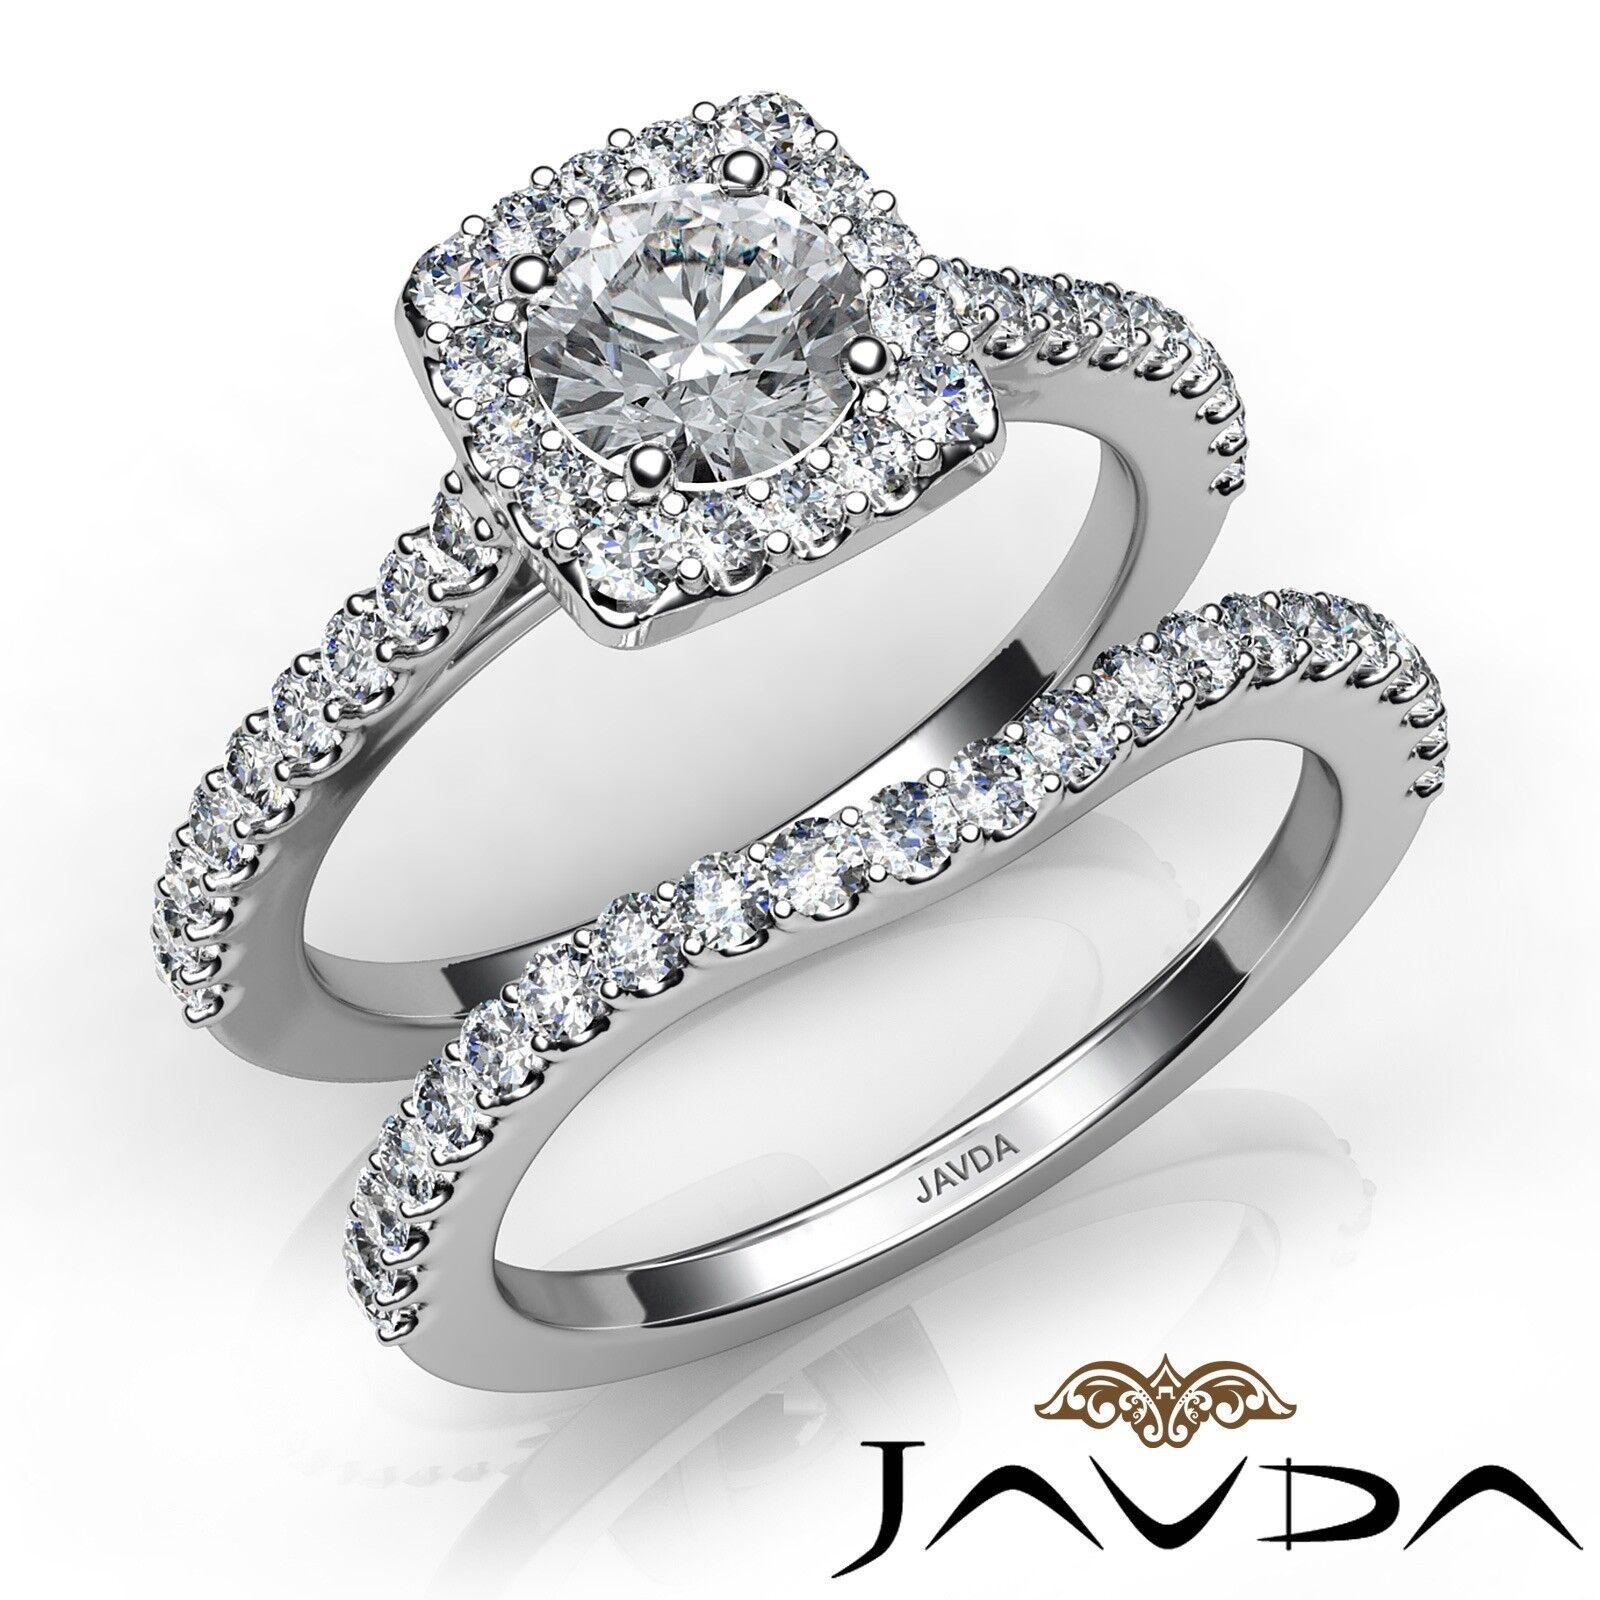 1.45ctw Halo U Prong Bridal Set Round Diamond Engagement Ring GIA E-VVS1 W Gold